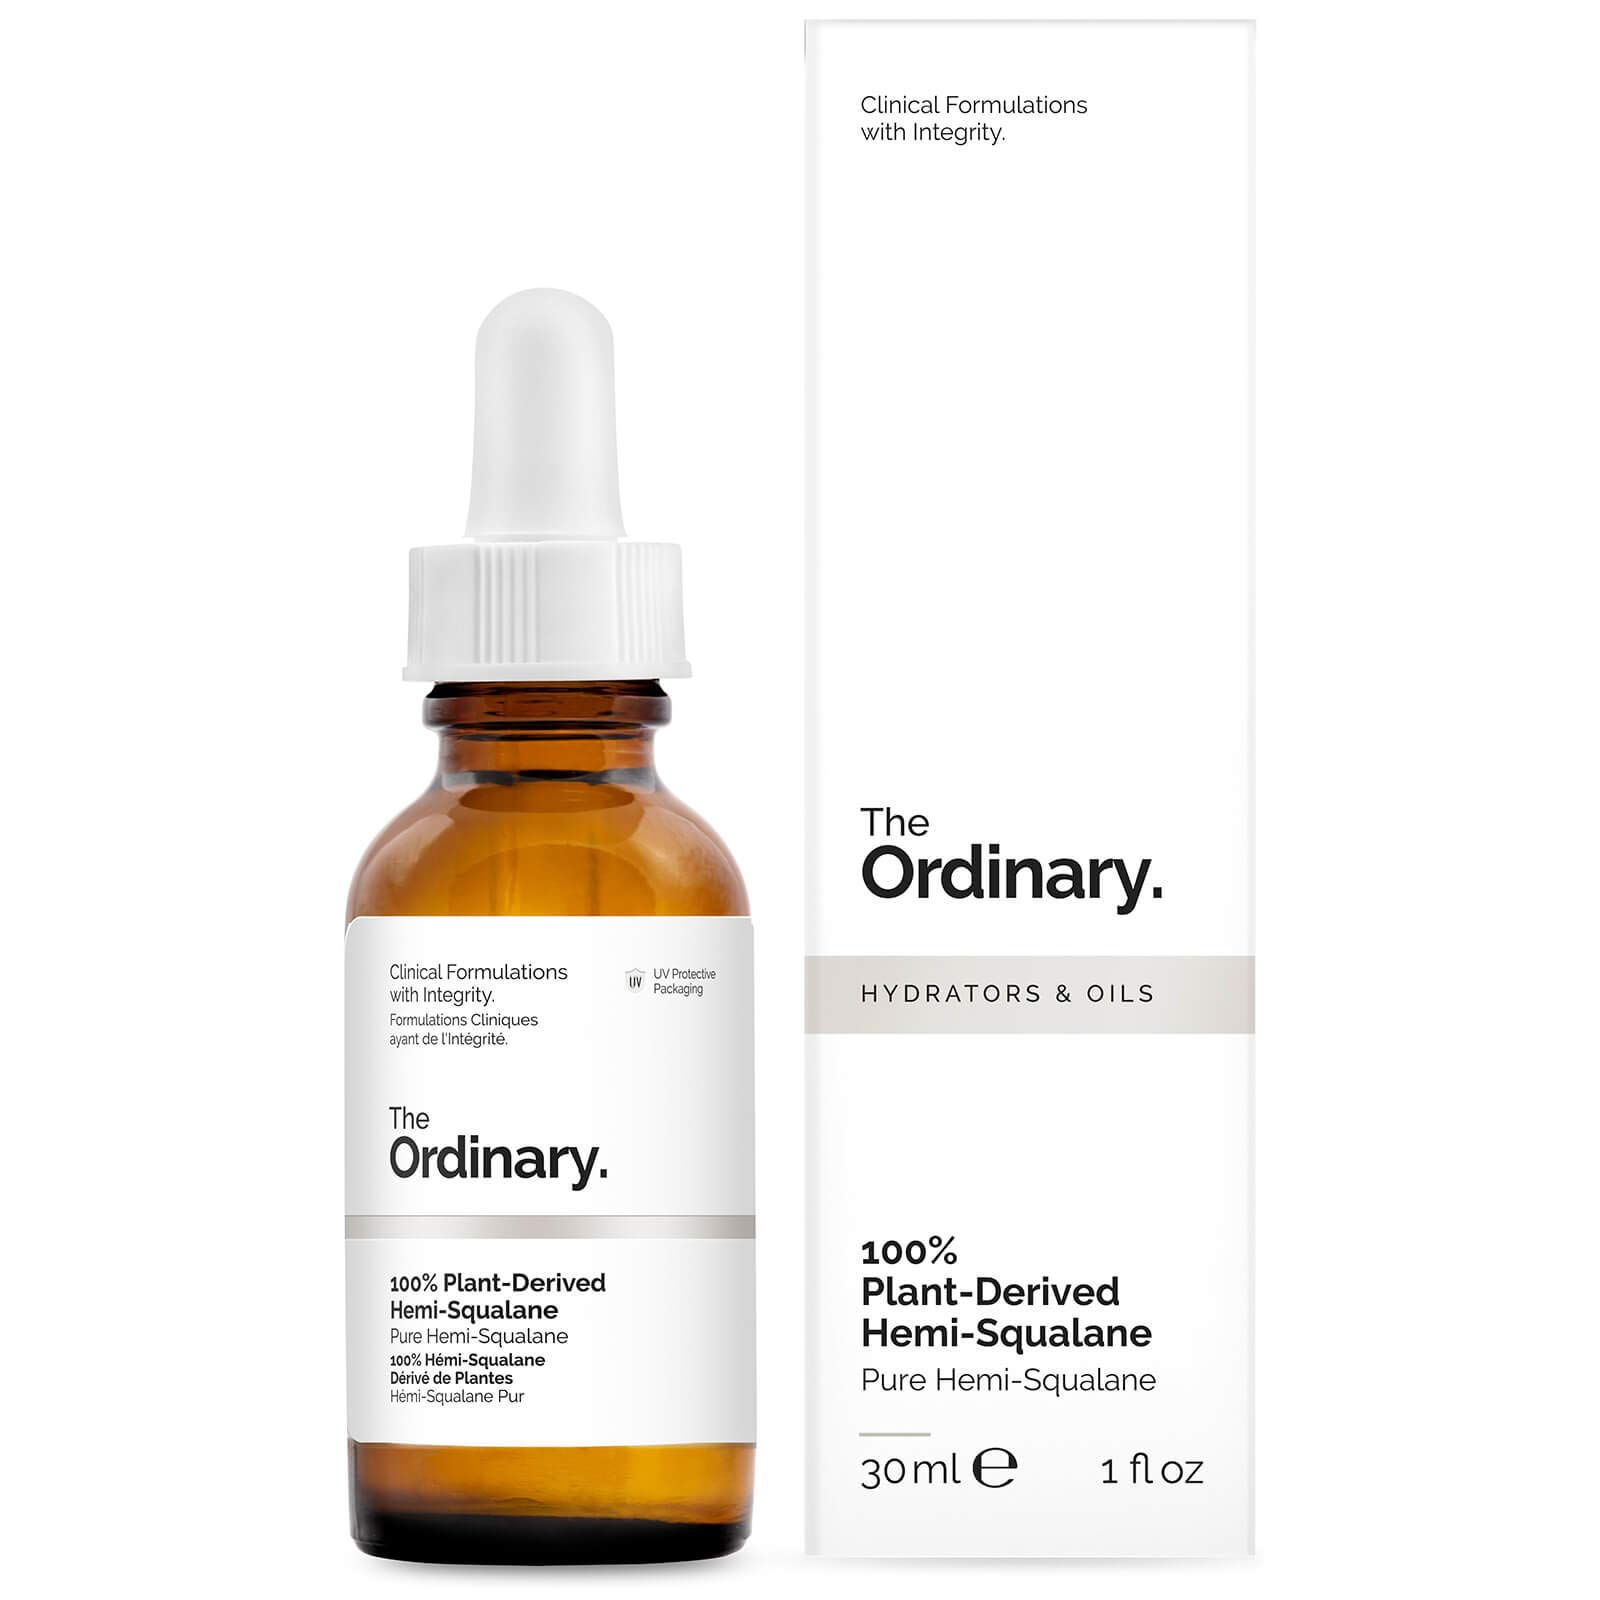 The Ordinary Skincare 100% Plant-Derived Hemi-Squalane 30ml